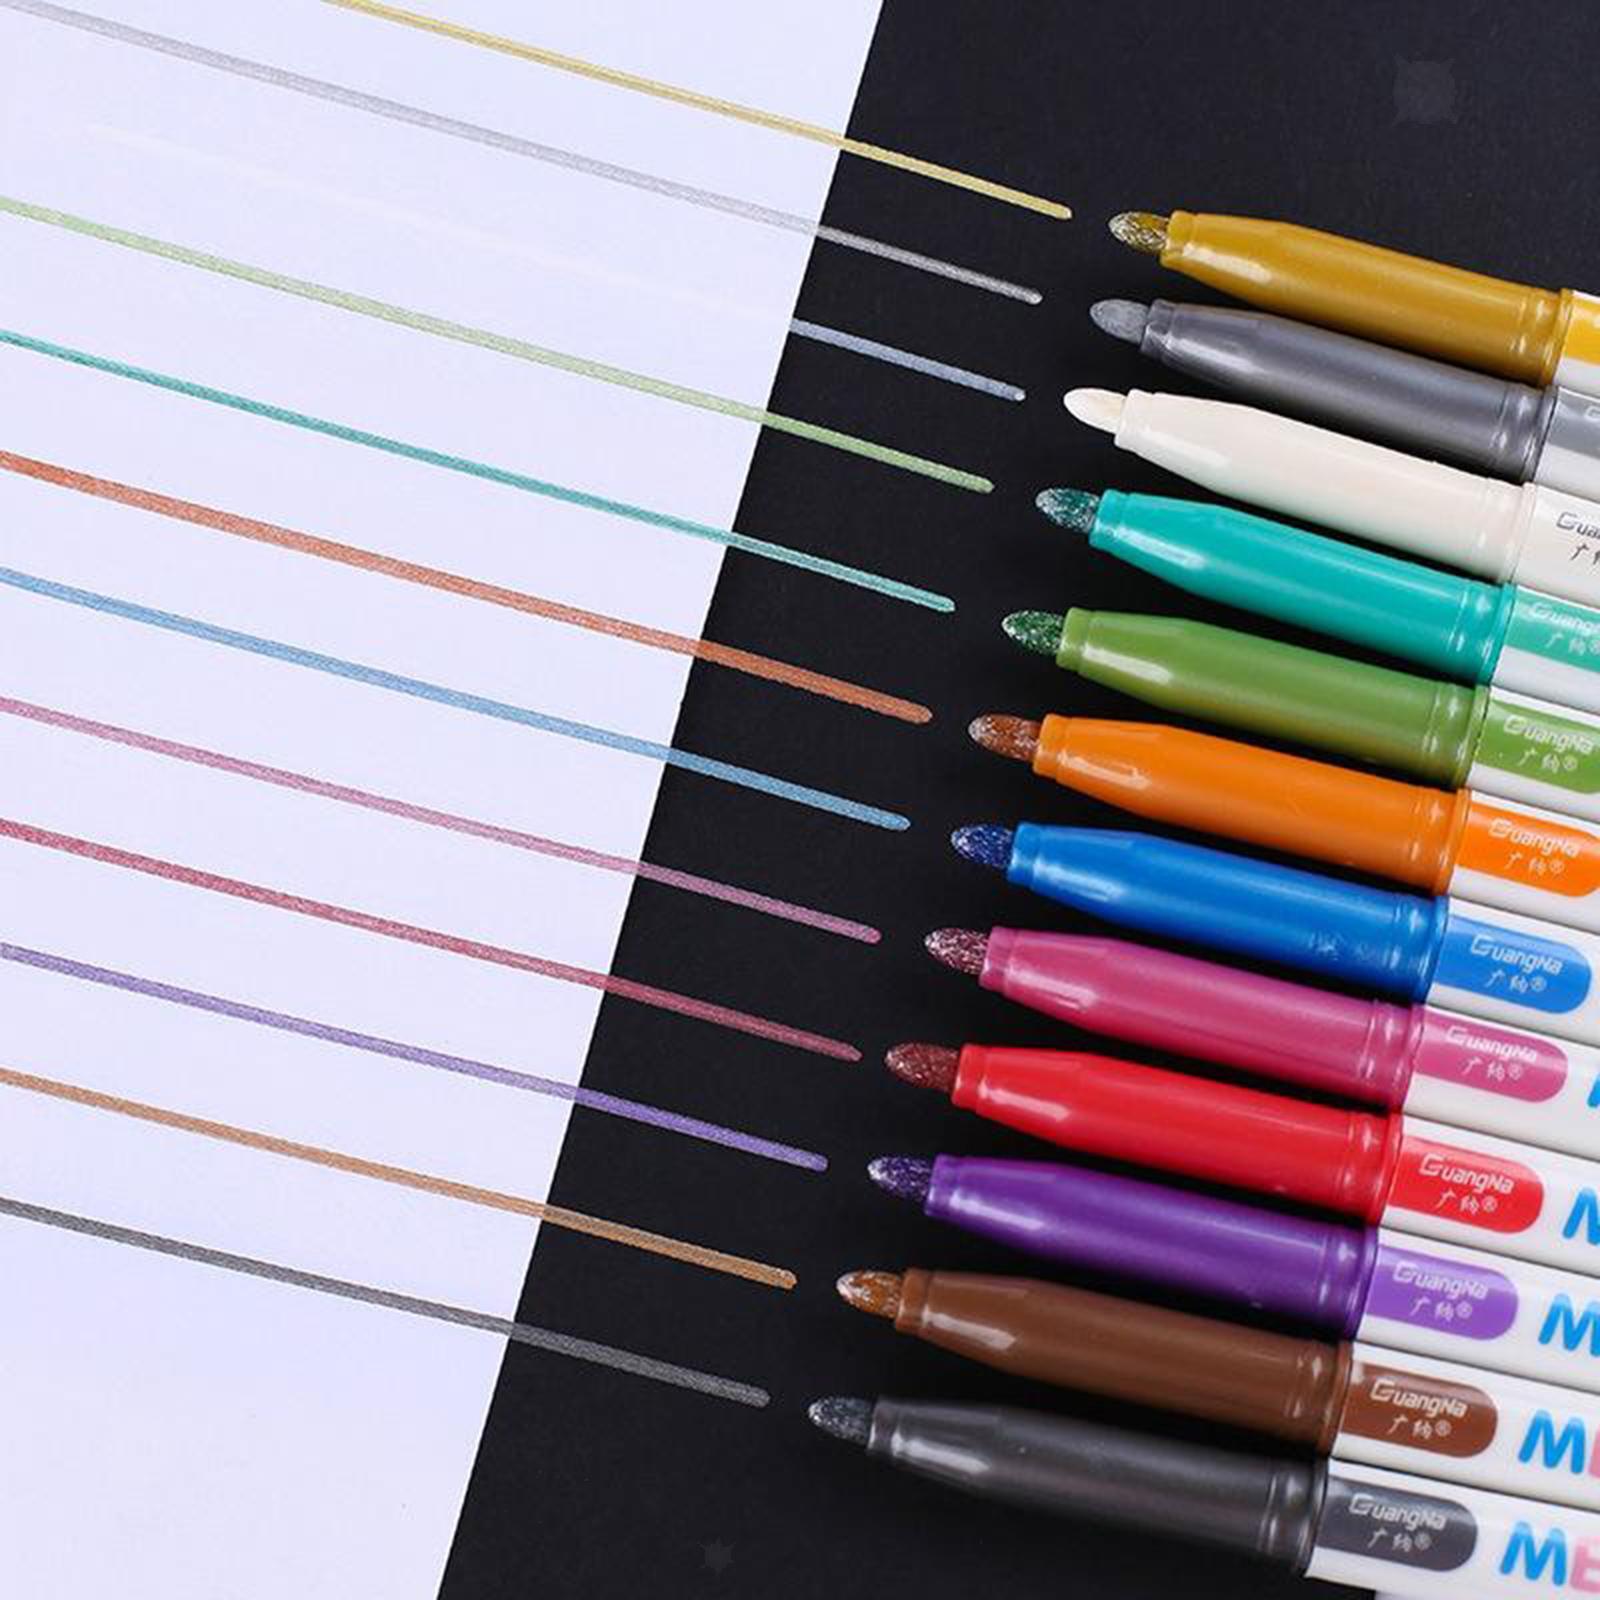 miniatura 11 - 8-12-20x-Permanente-Metallic-Marcatori-Vernici-Penne-per-Adulti-Colouring